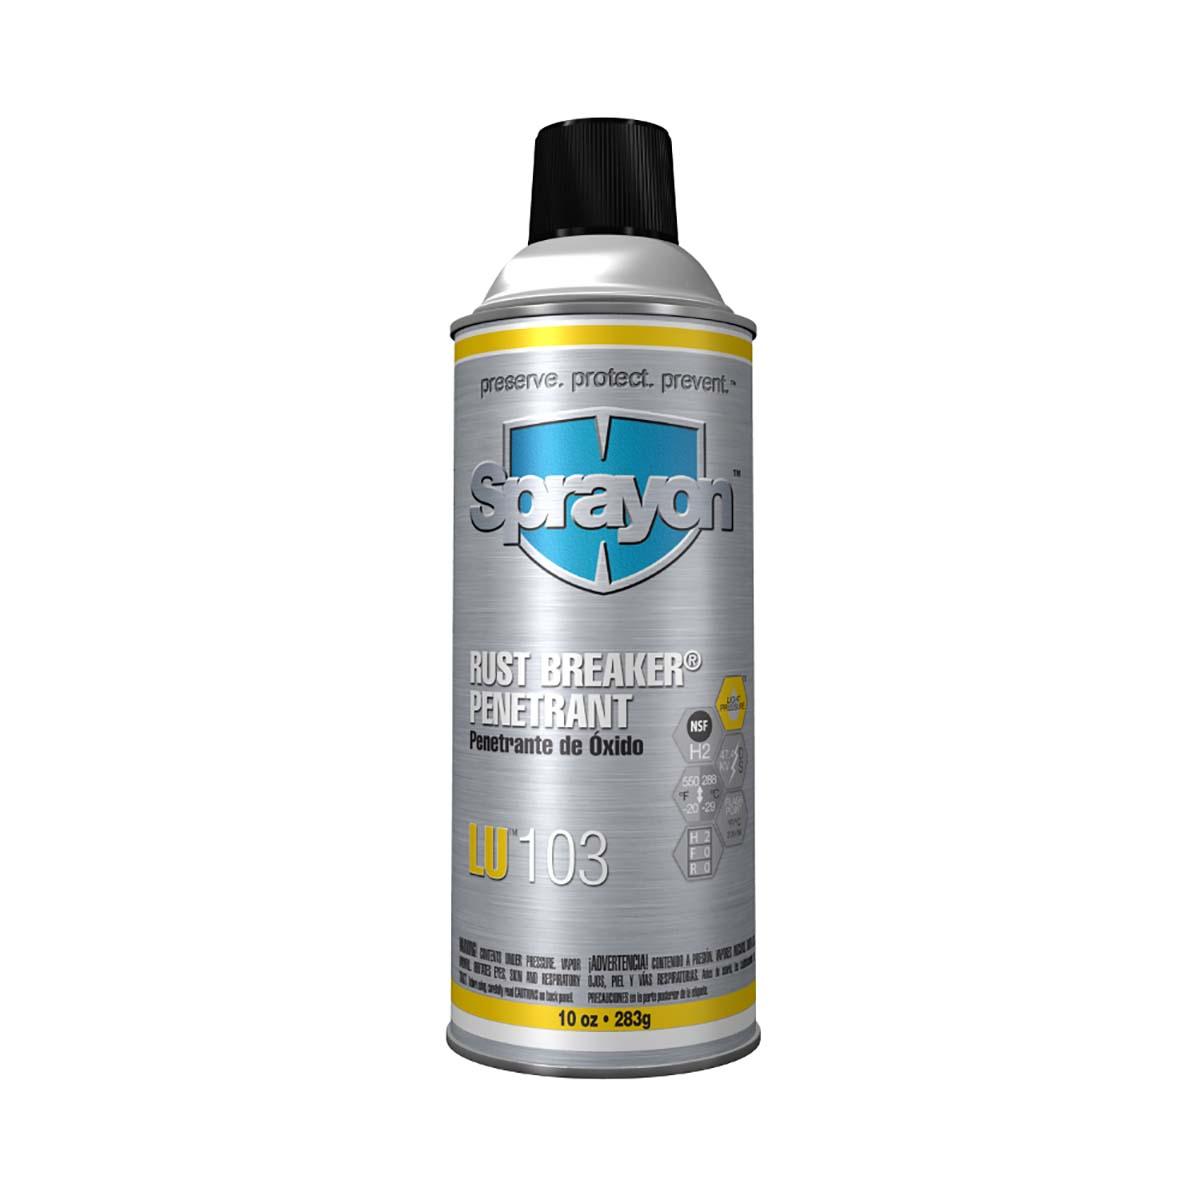 Sprayon High-Performance Rust Penetrant - Rust Breaker - Aerosol